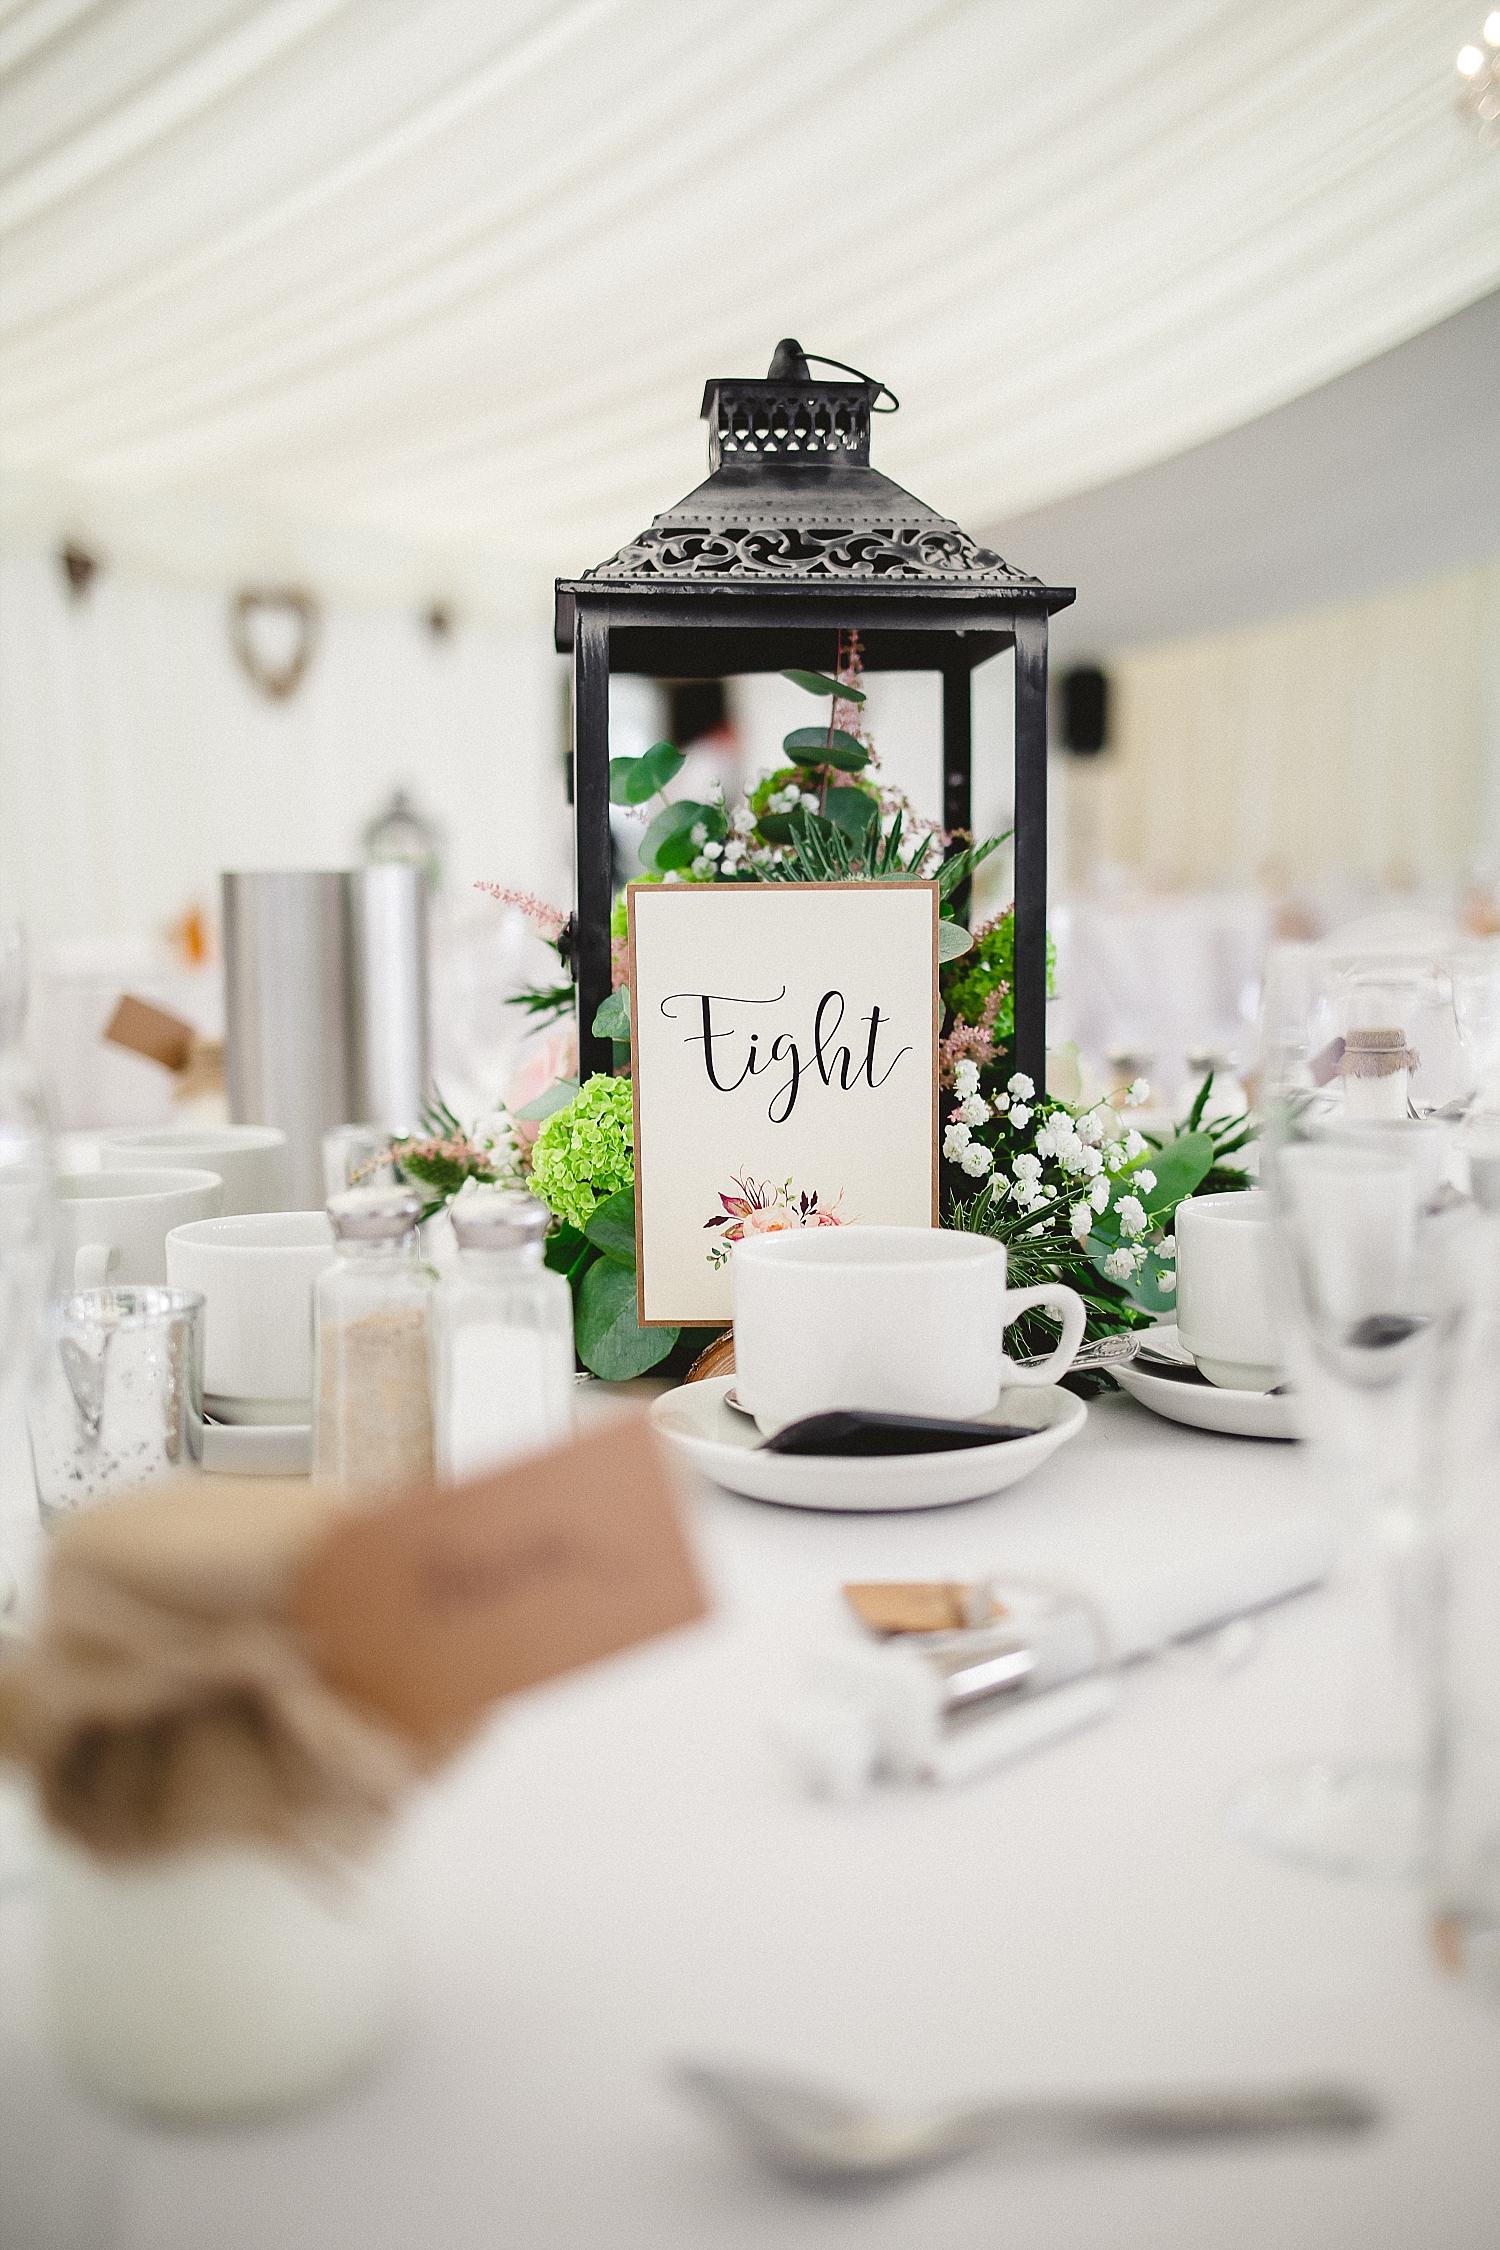 Moor Hall Wedding Venue - Reception Floral Details - Essex Wedding Photographer